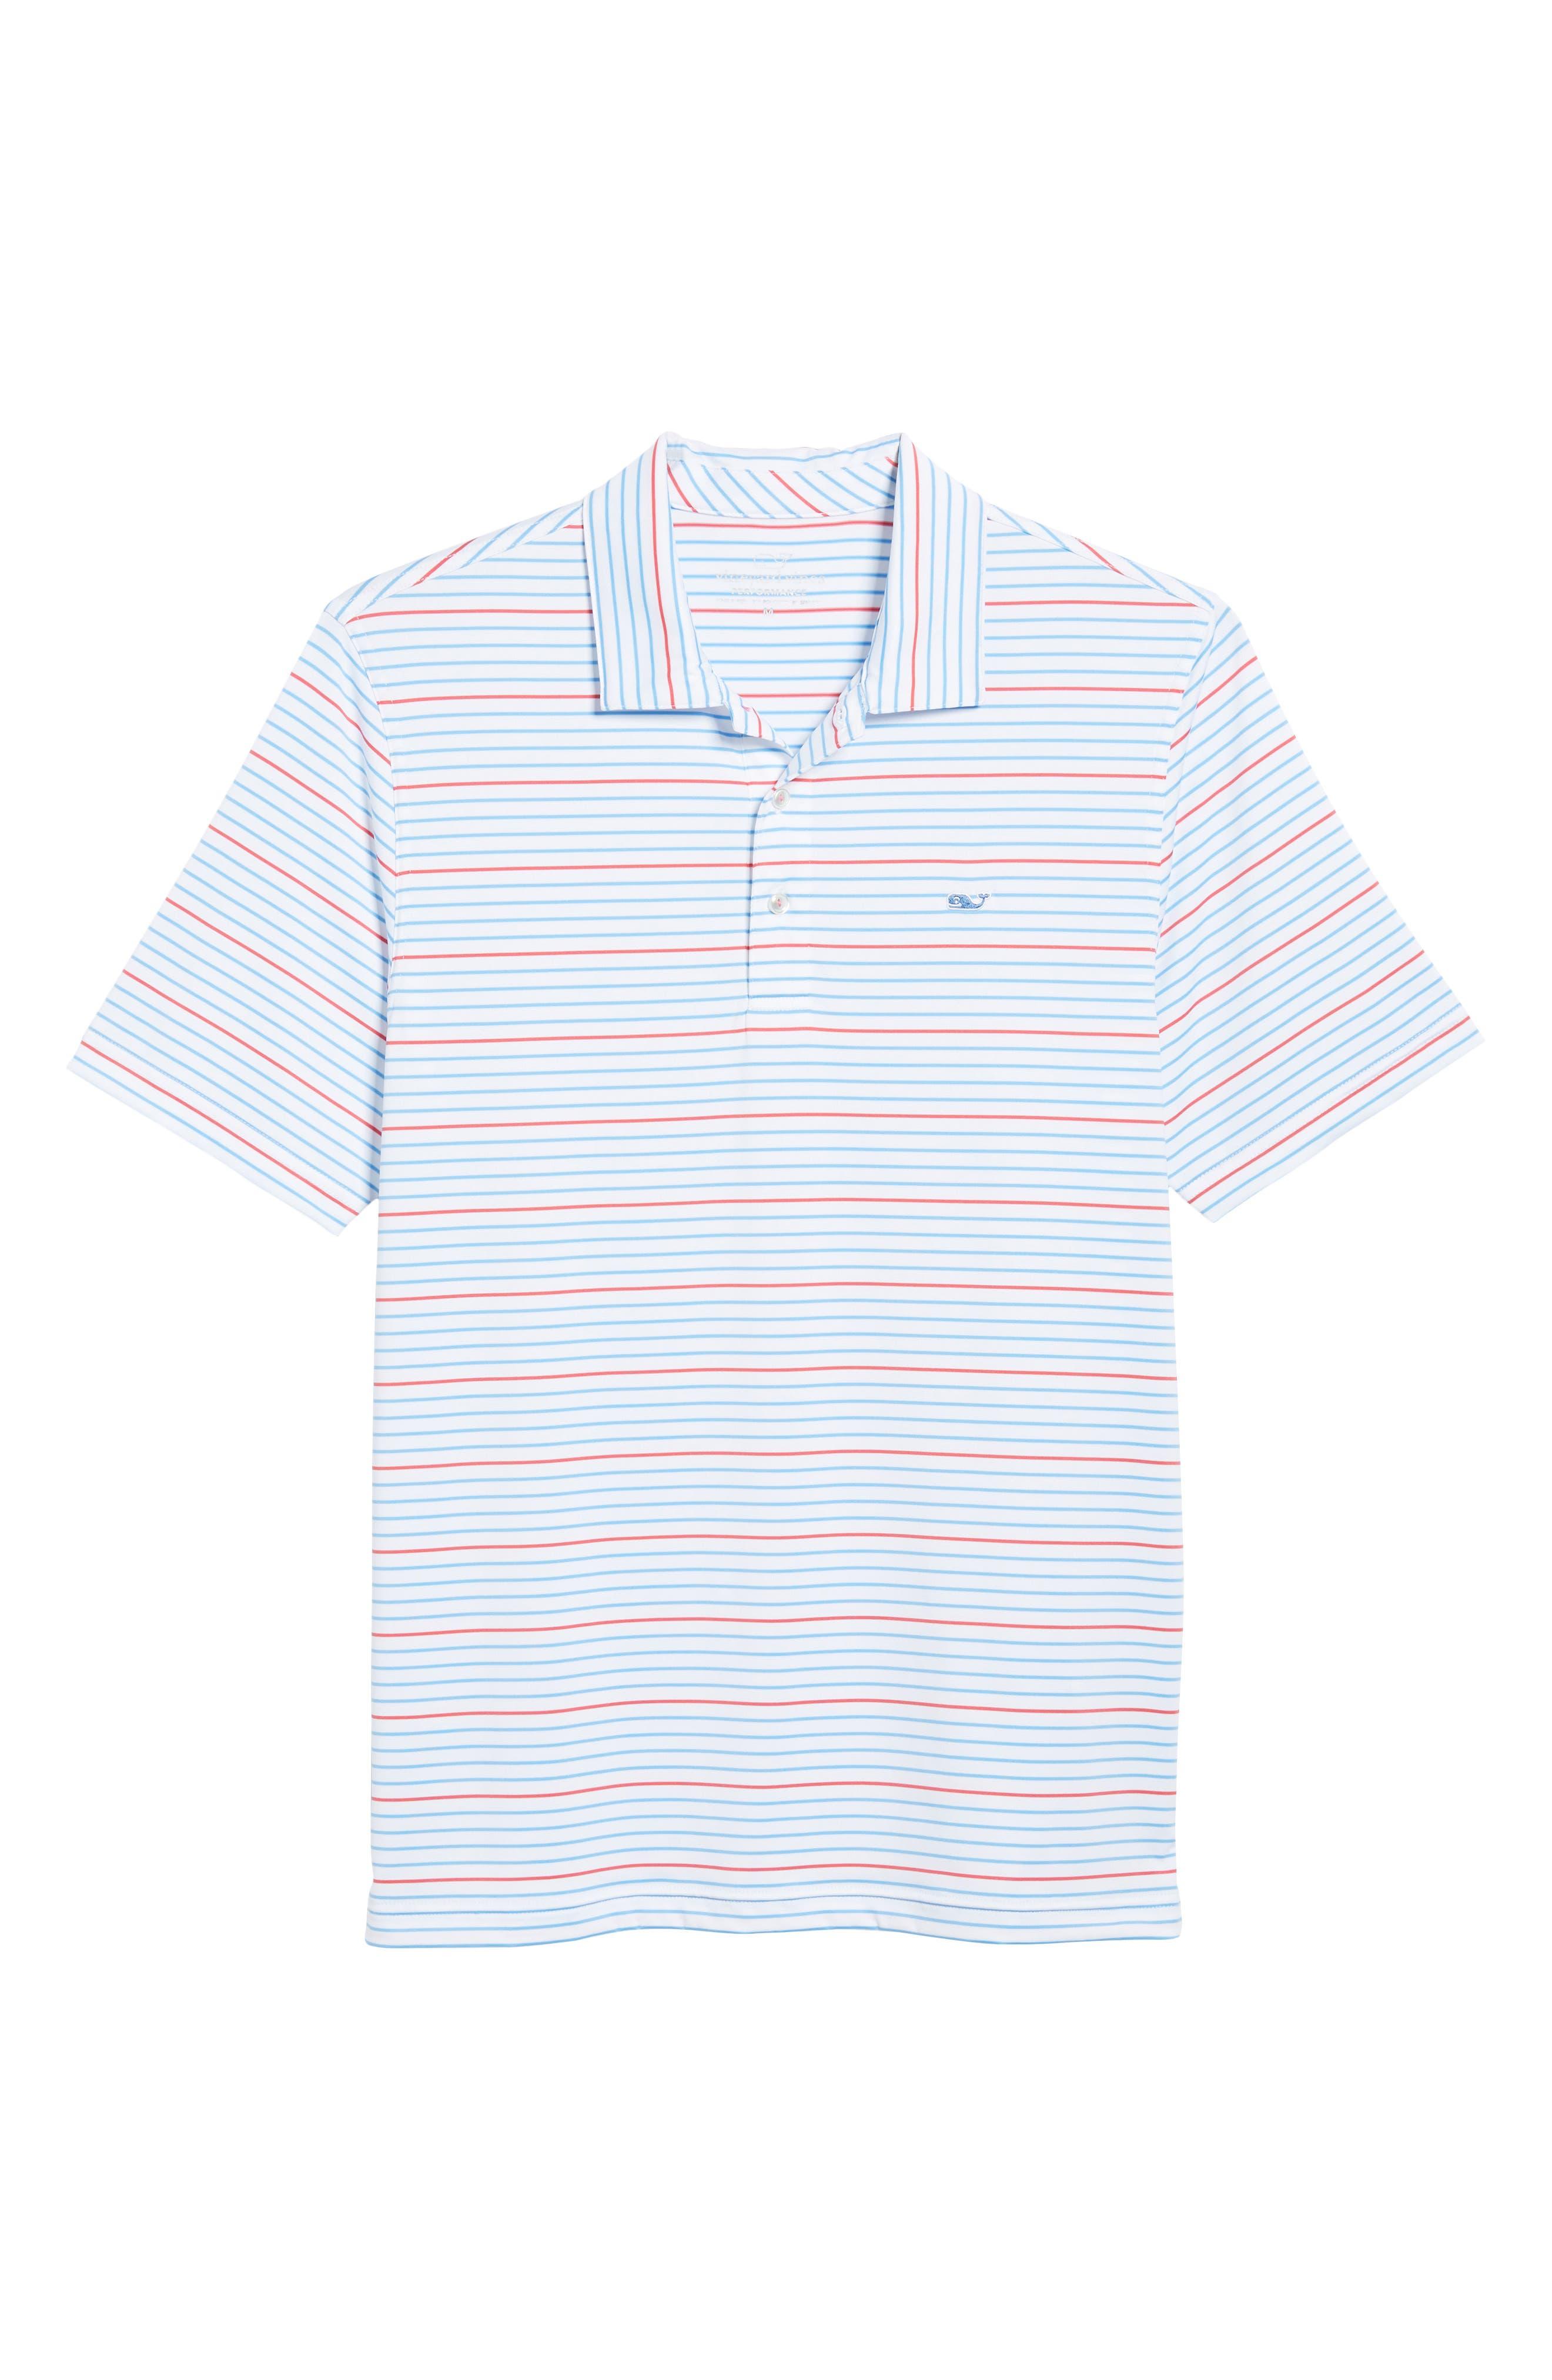 Swindell Stretch Stripe Polo,                             Alternate thumbnail 6, color,                             White Cap